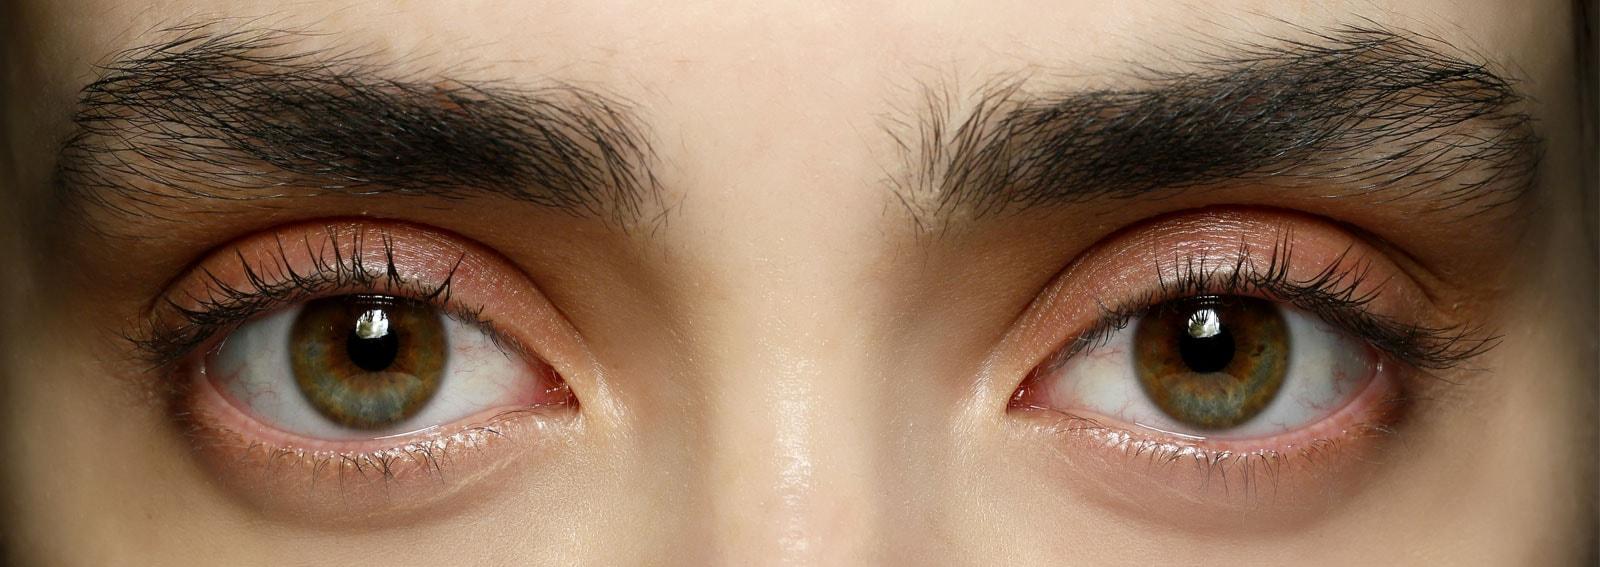 glossy-lids-trucco-occhi-palpebre-glossate-cover-desktop-01